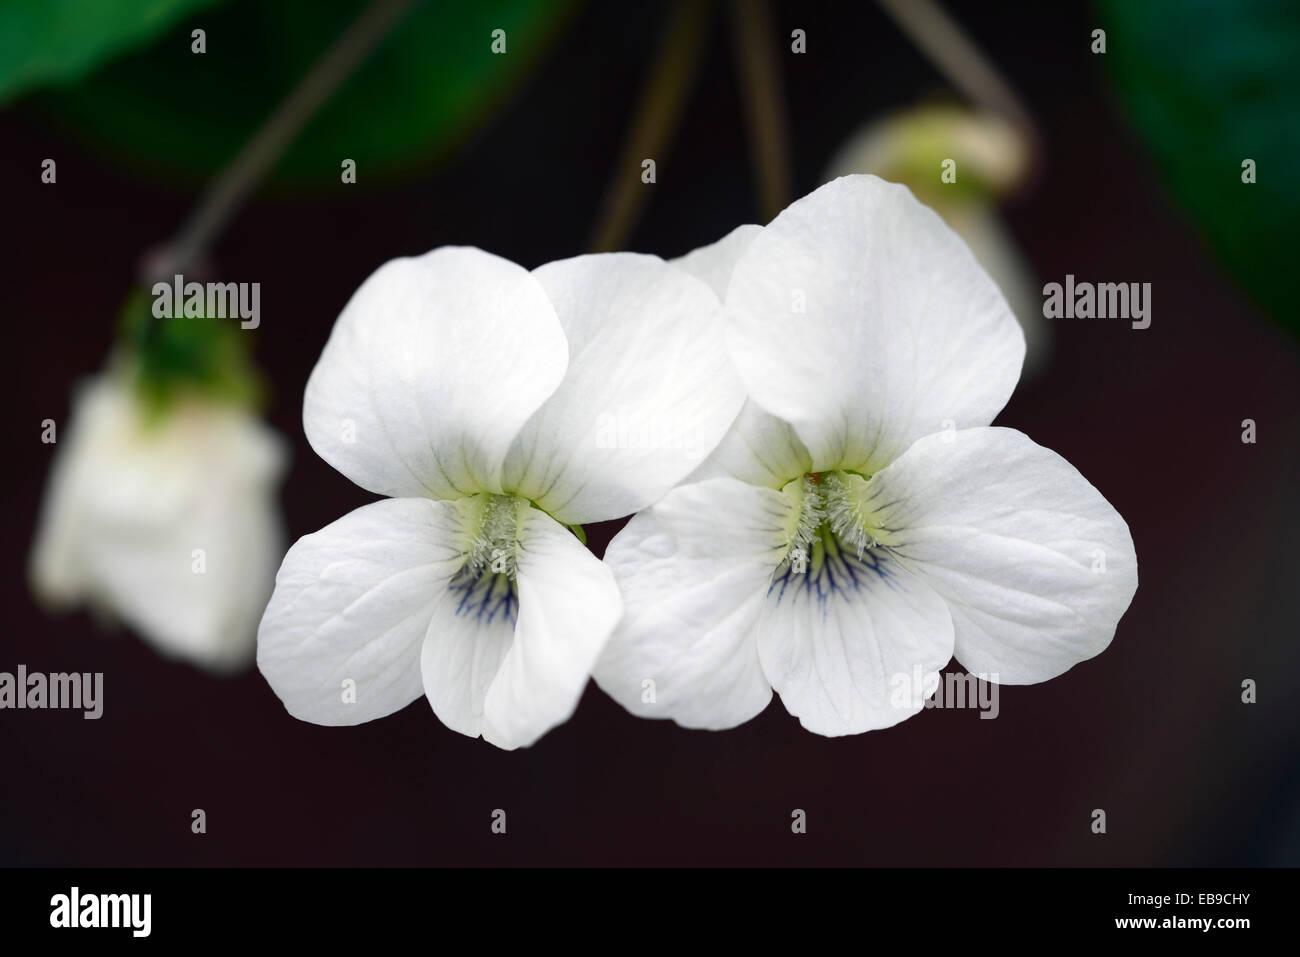 viola sororia albiflora violet white flowers closeup plant portraits petals perennials flower flowering RM Floral - Stock Image